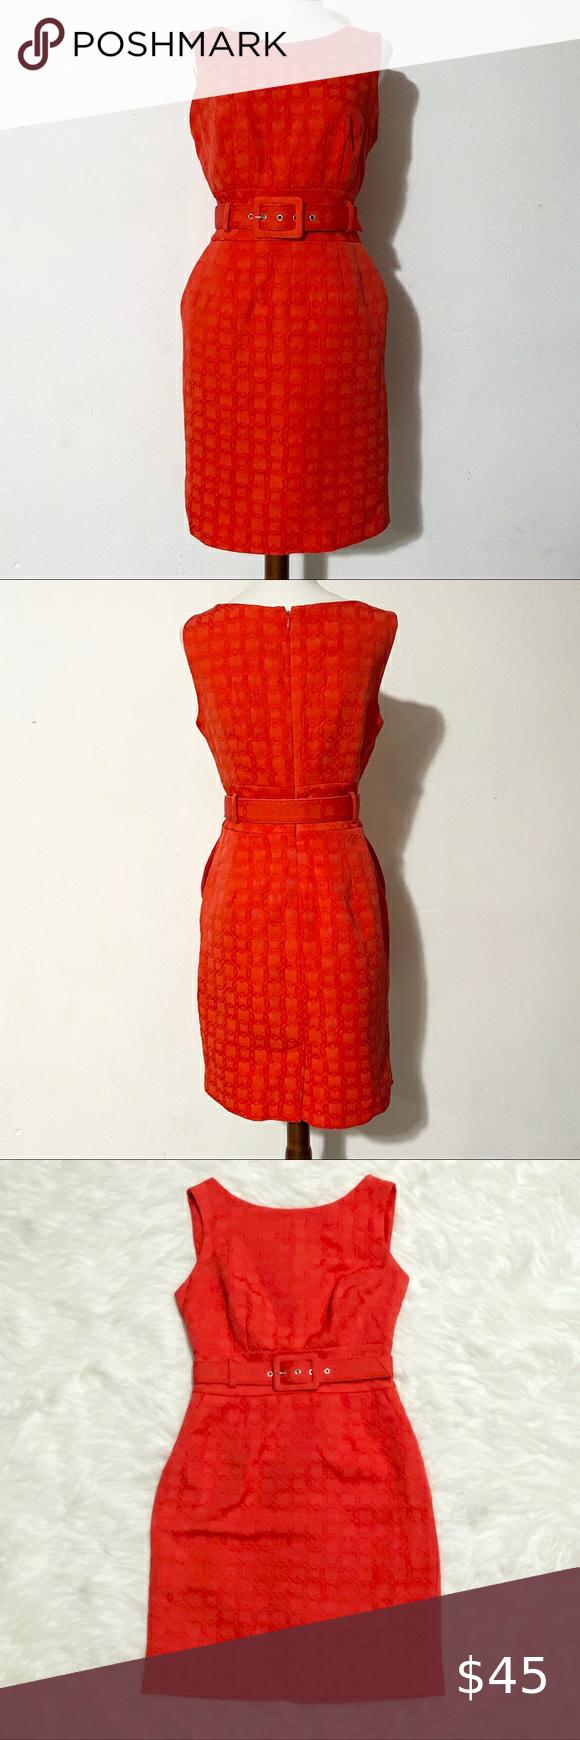 BANANA REPUBLIC Orange Belted Dress BANANA REPUBLI